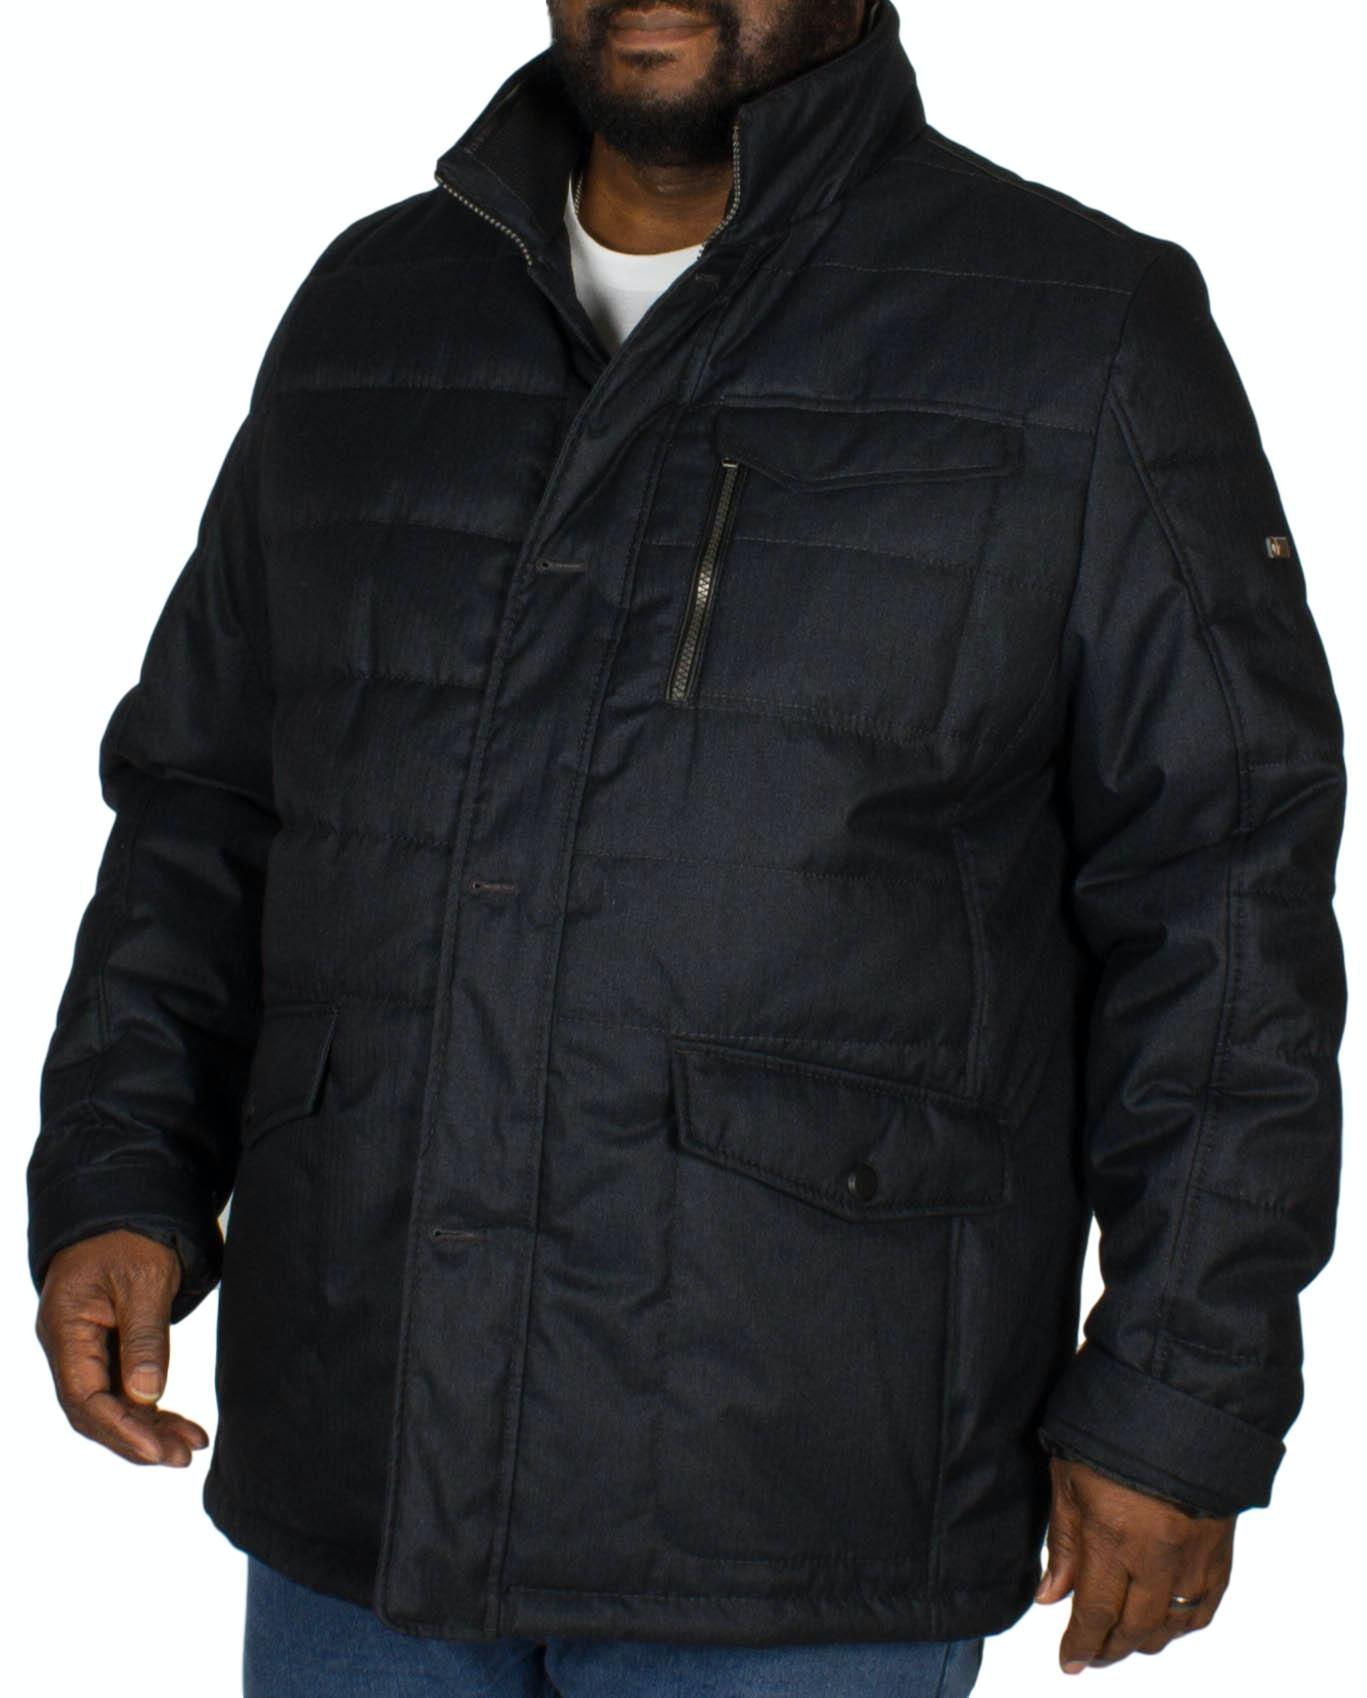 Cabano Wool-look Jacket Navy